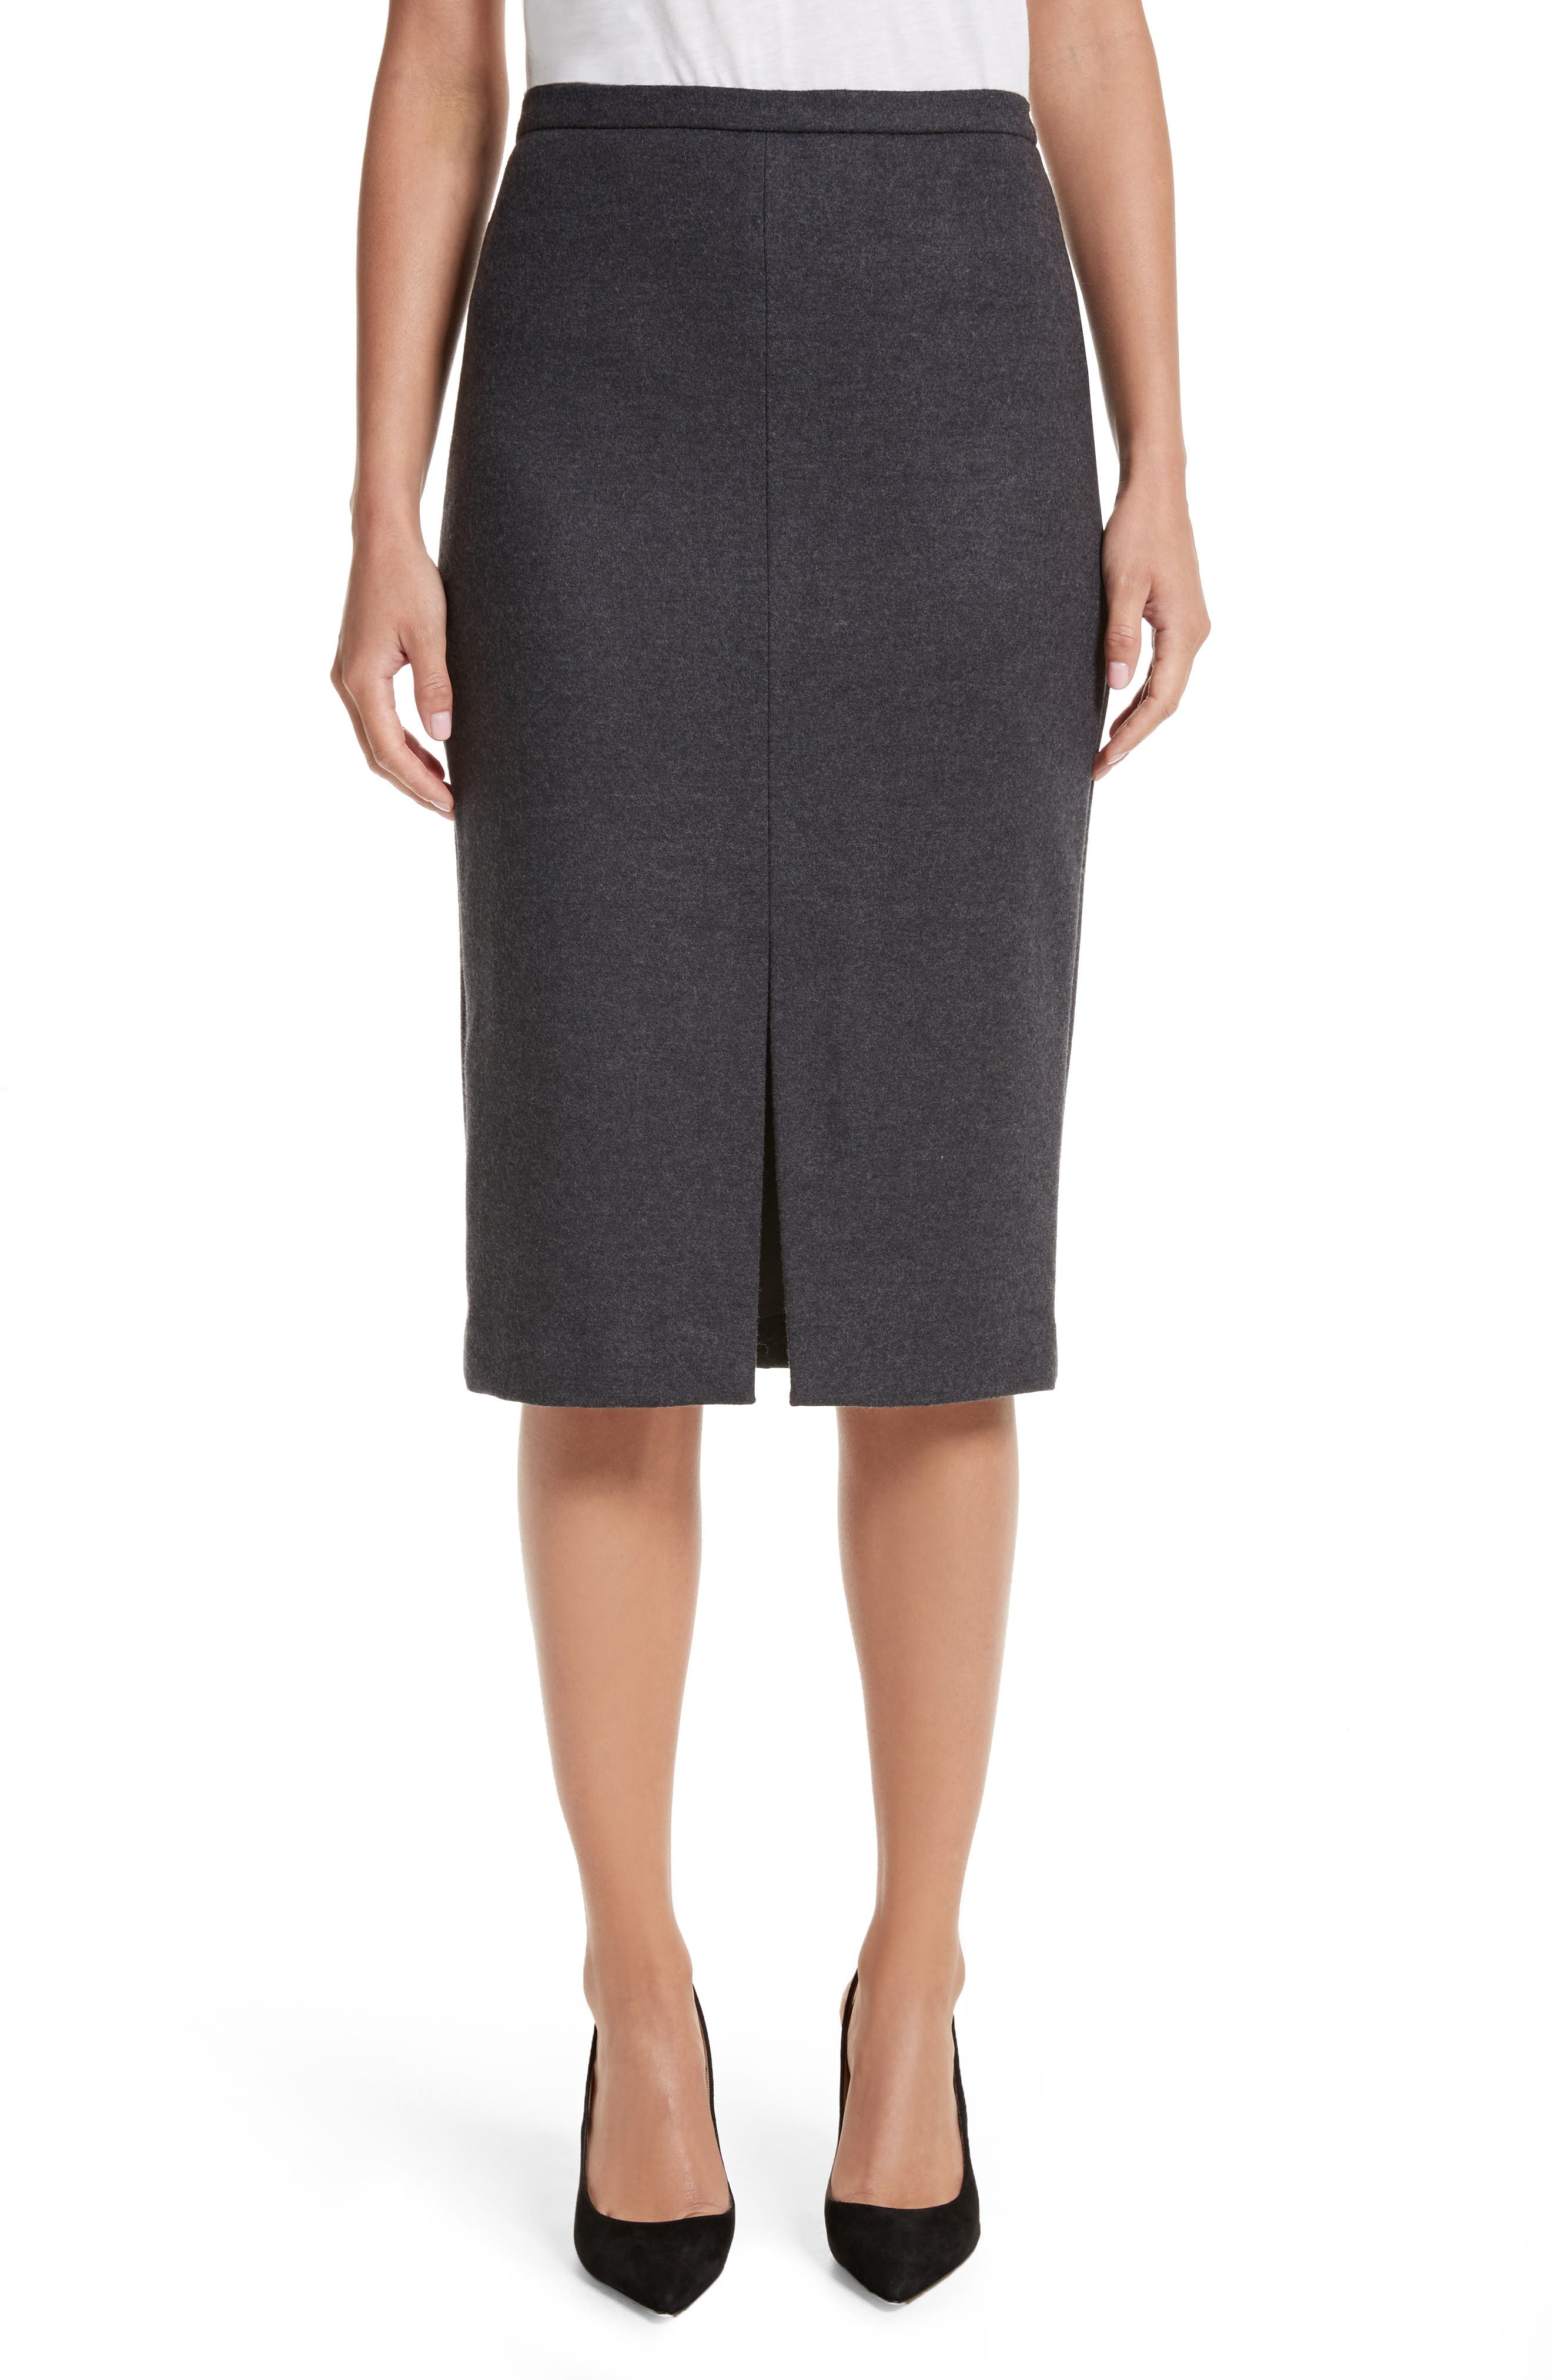 Alternate Image 1 Selected - Max Mara Nanna Leather Trim Wool Pencil Skirt